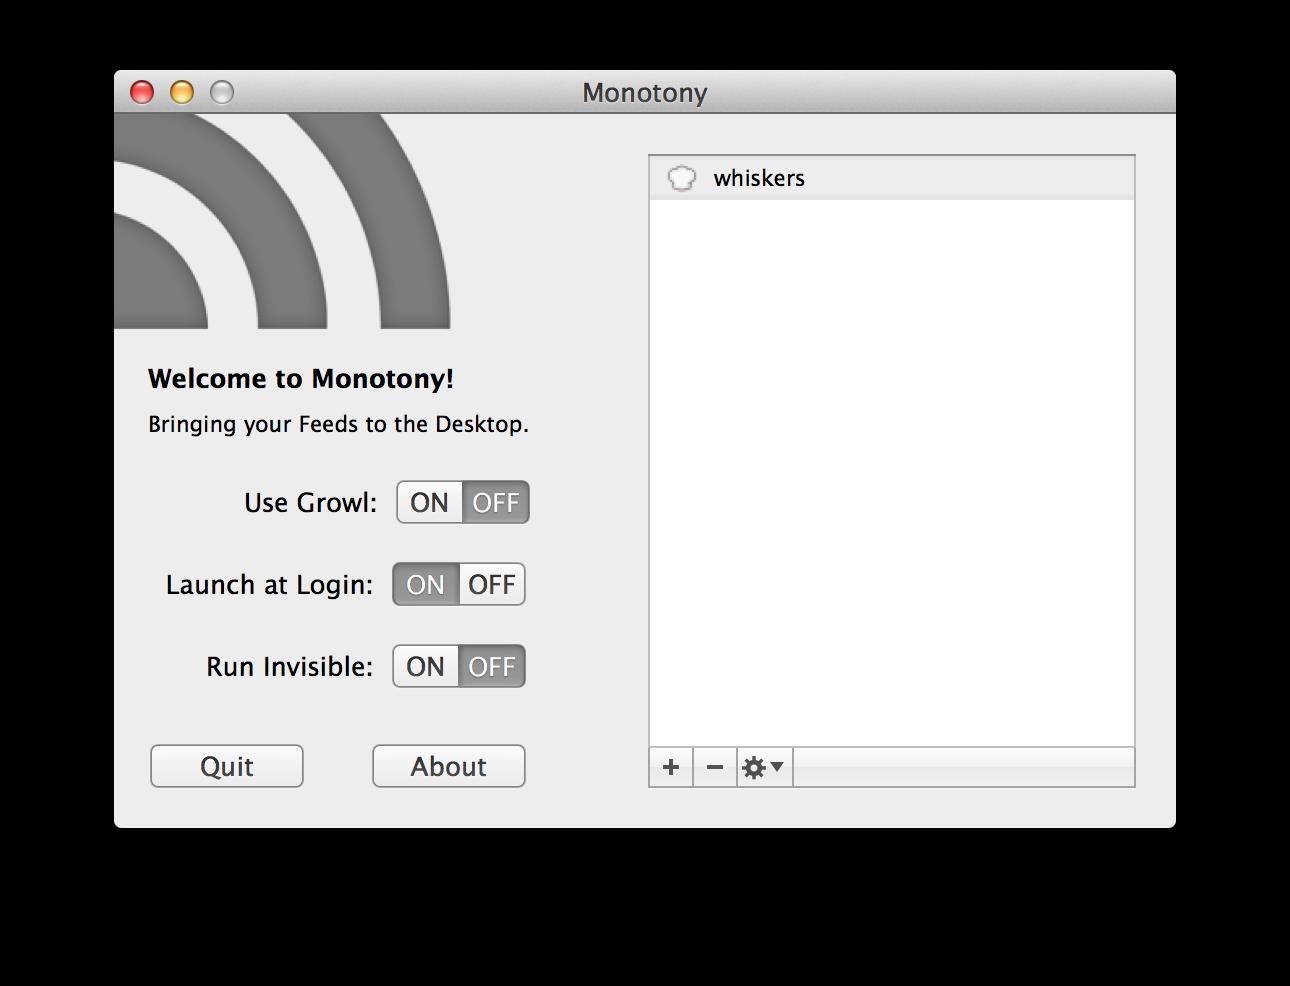 Monotony設定画面